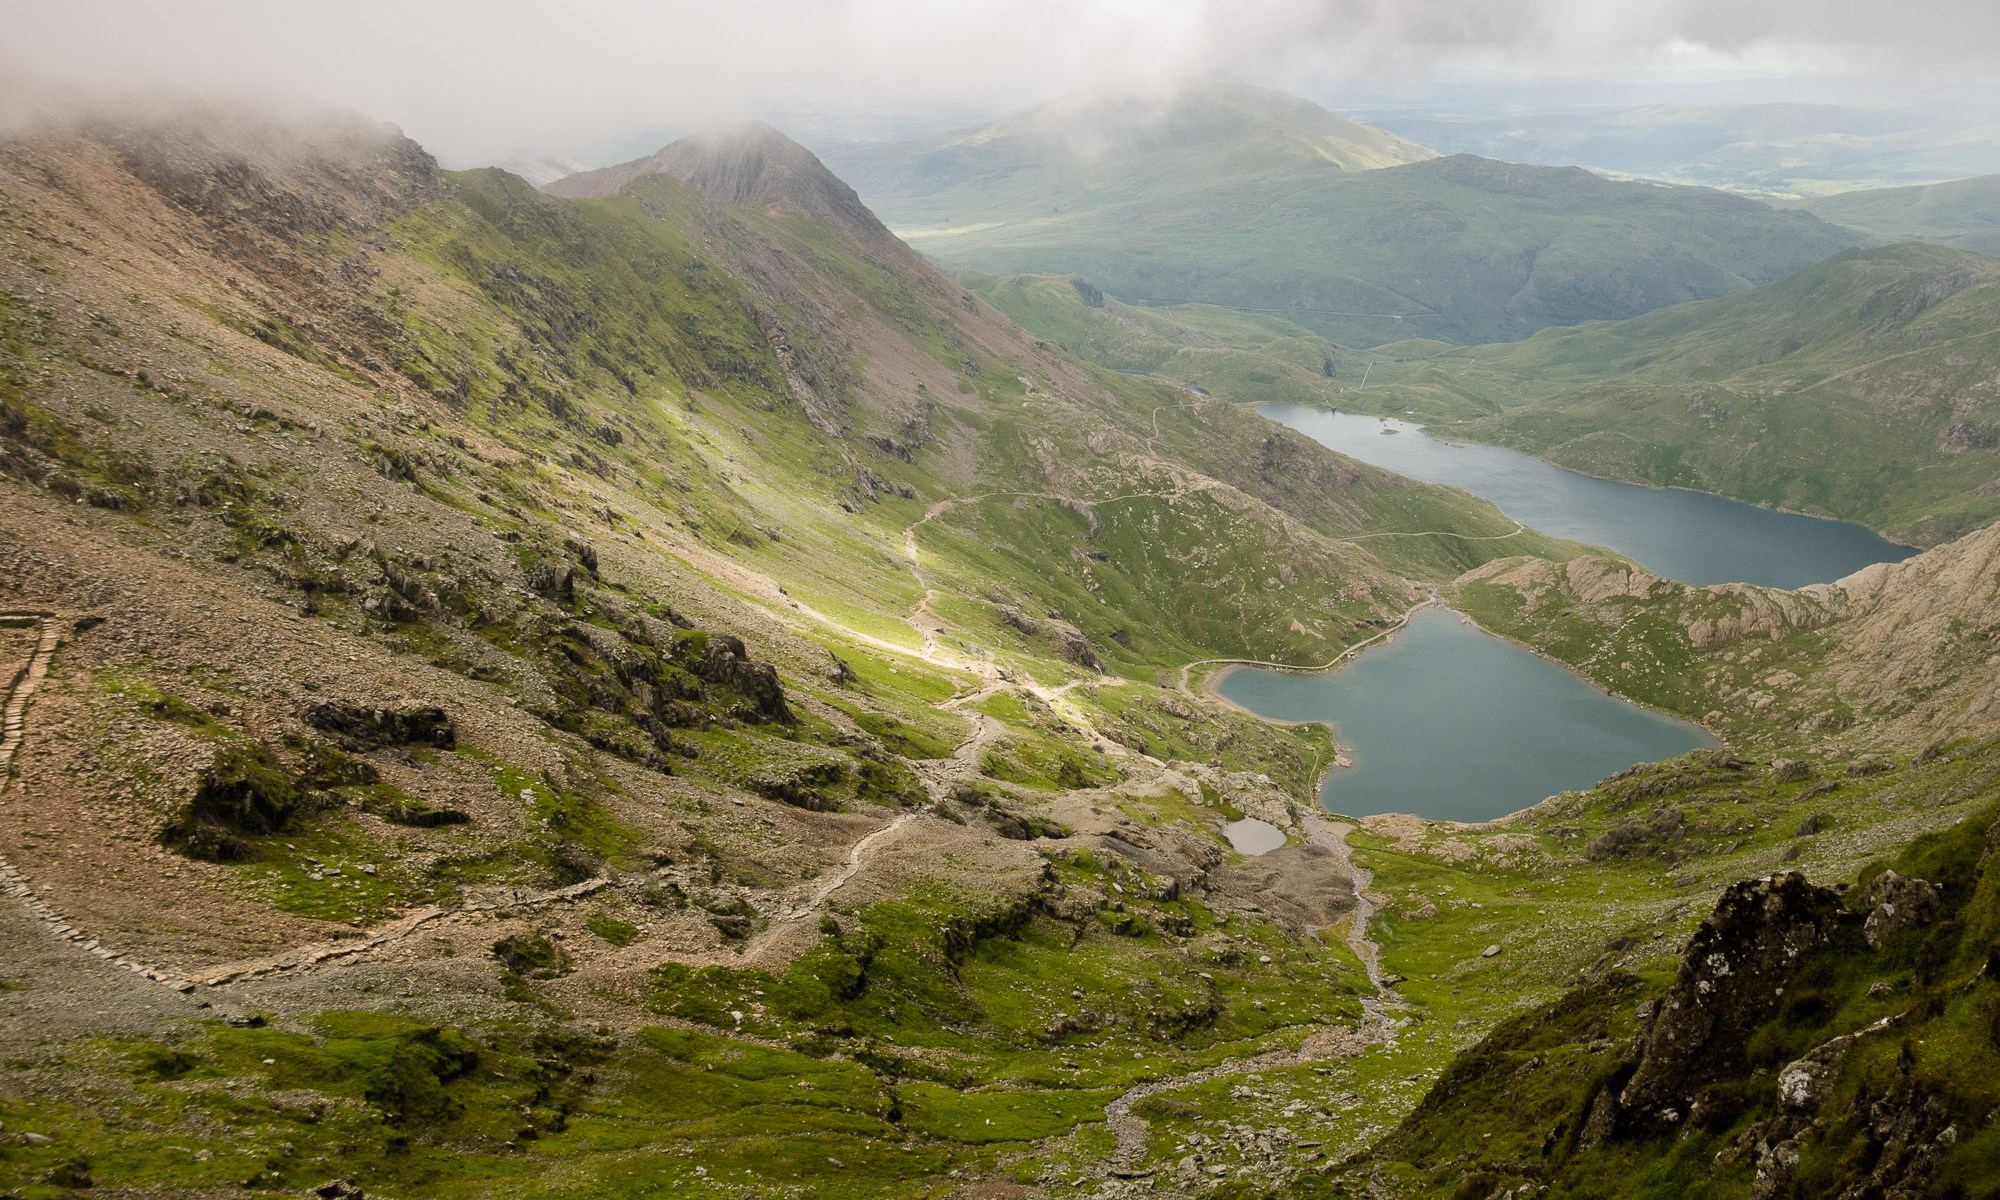 Snowdonia National Park landscape